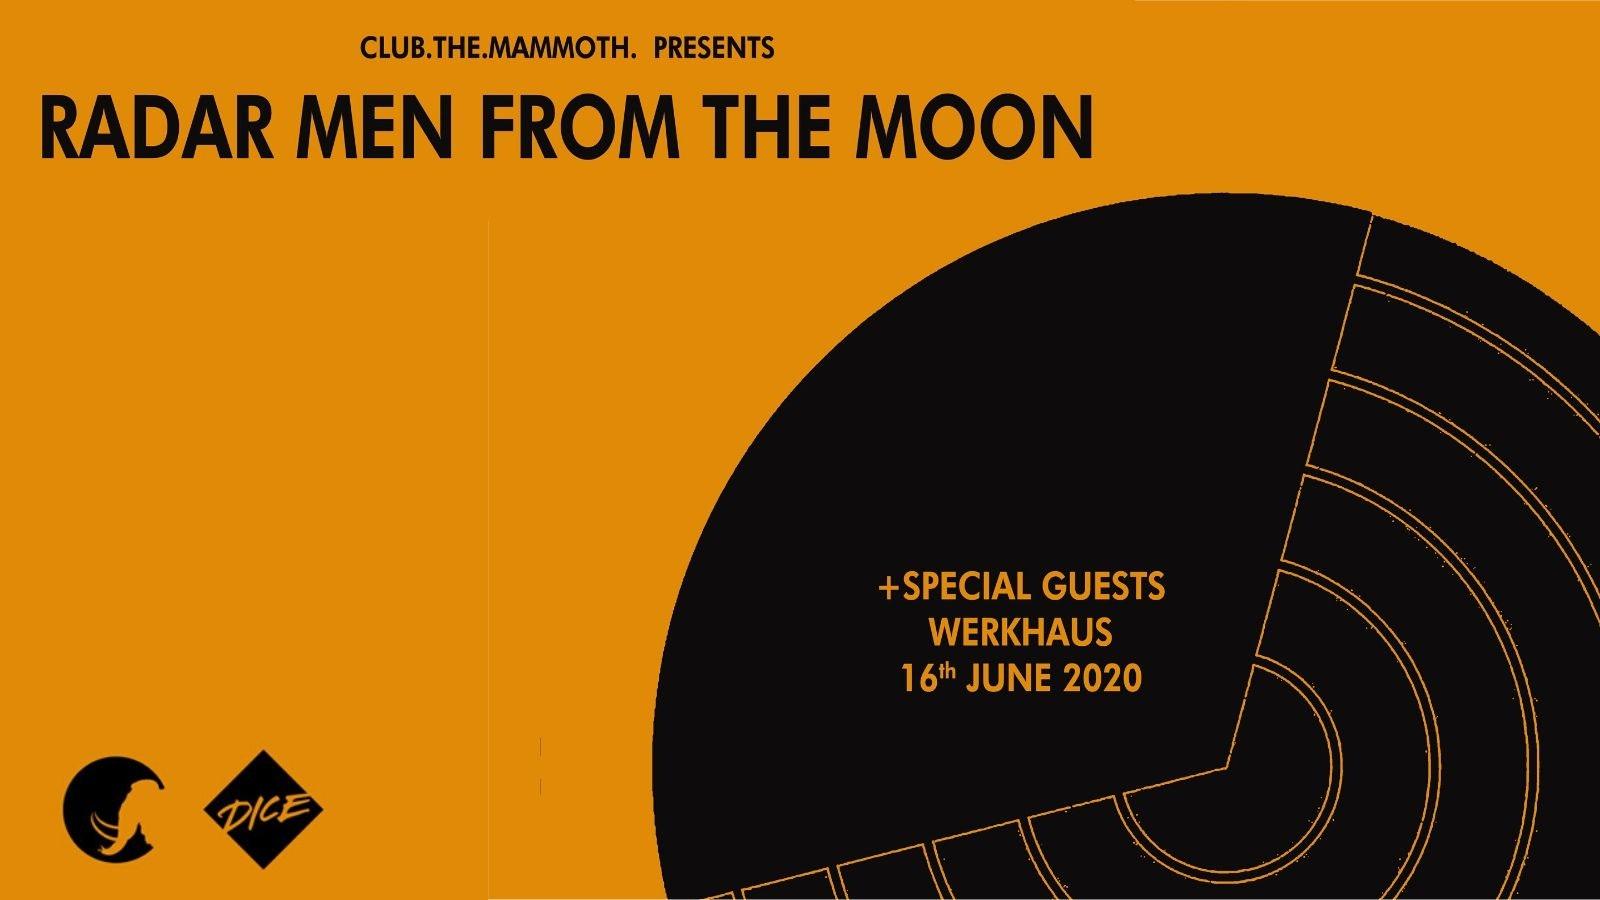 Club The Mammoth: Radar Men From The Moon